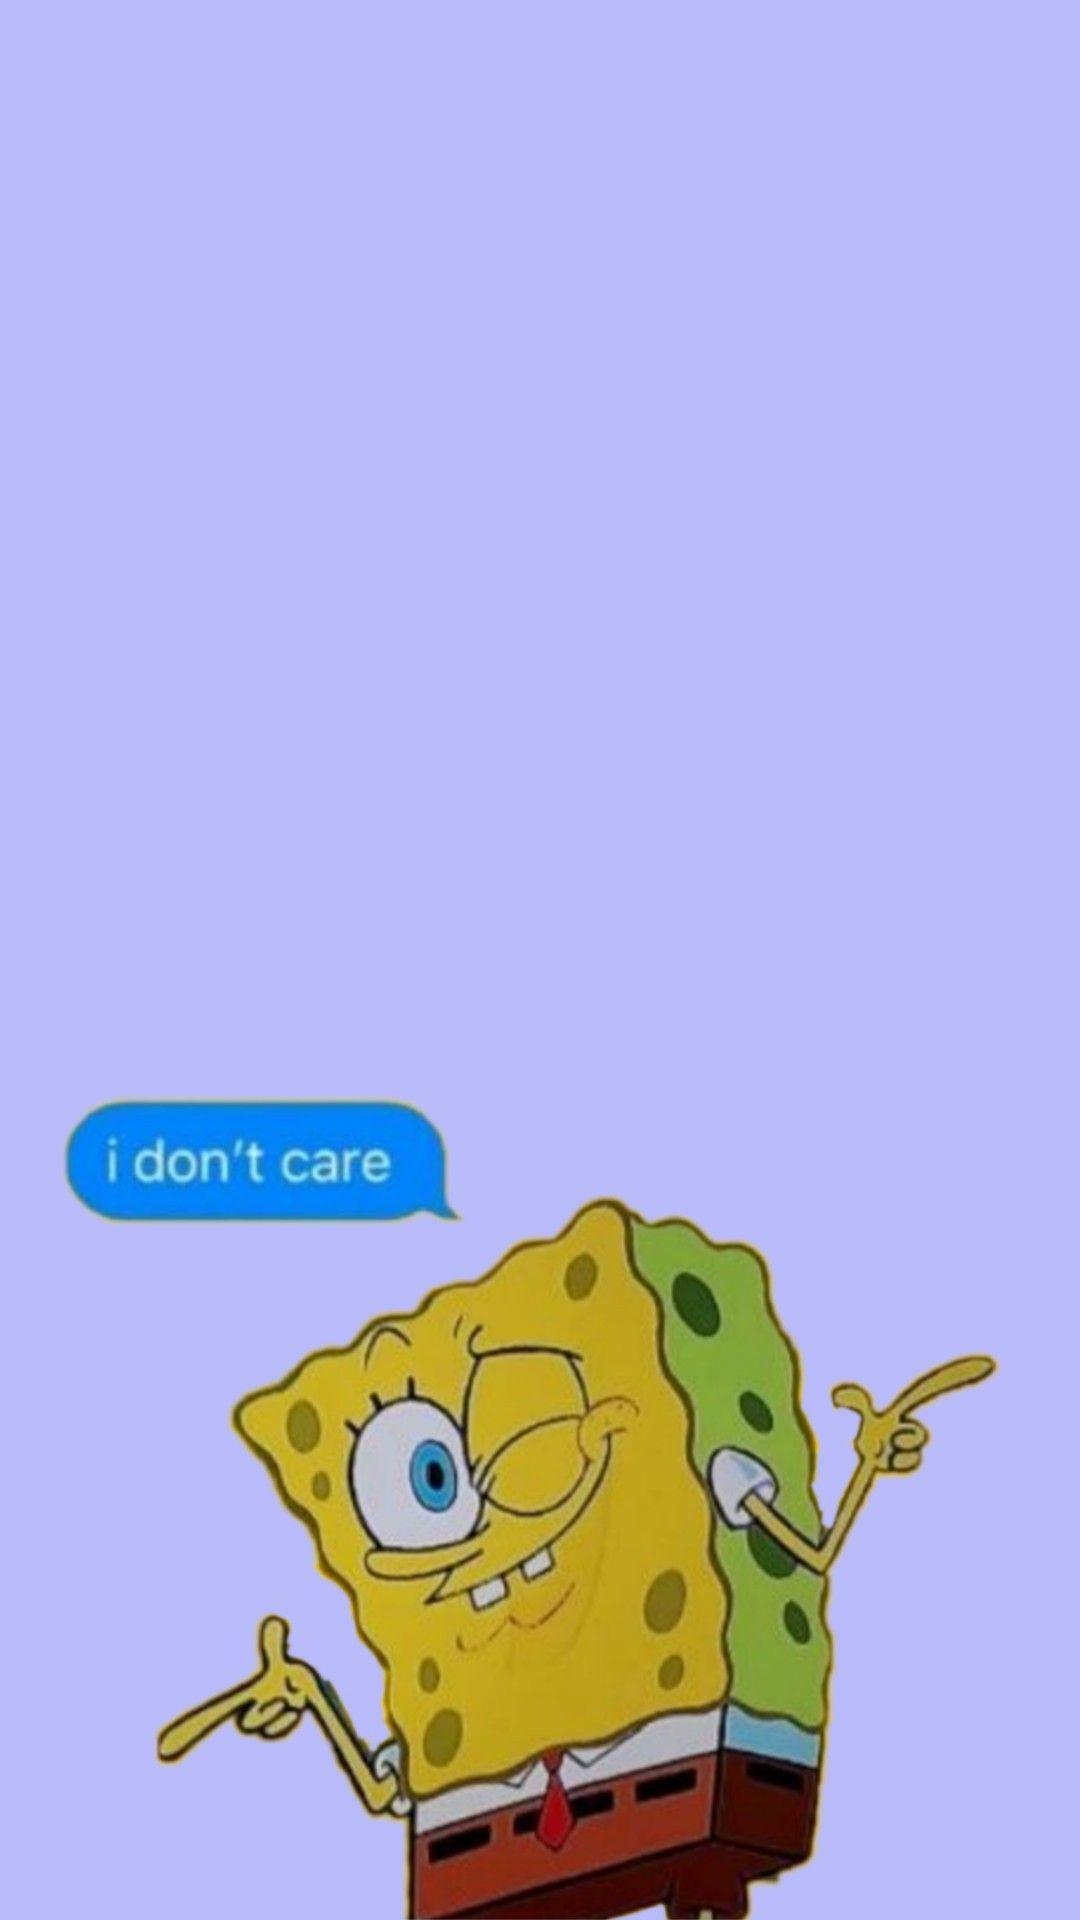 Spongebob Squarepants Cartoon Wallpaper Iphone Funny Phone Wallpaper Spongebob Background